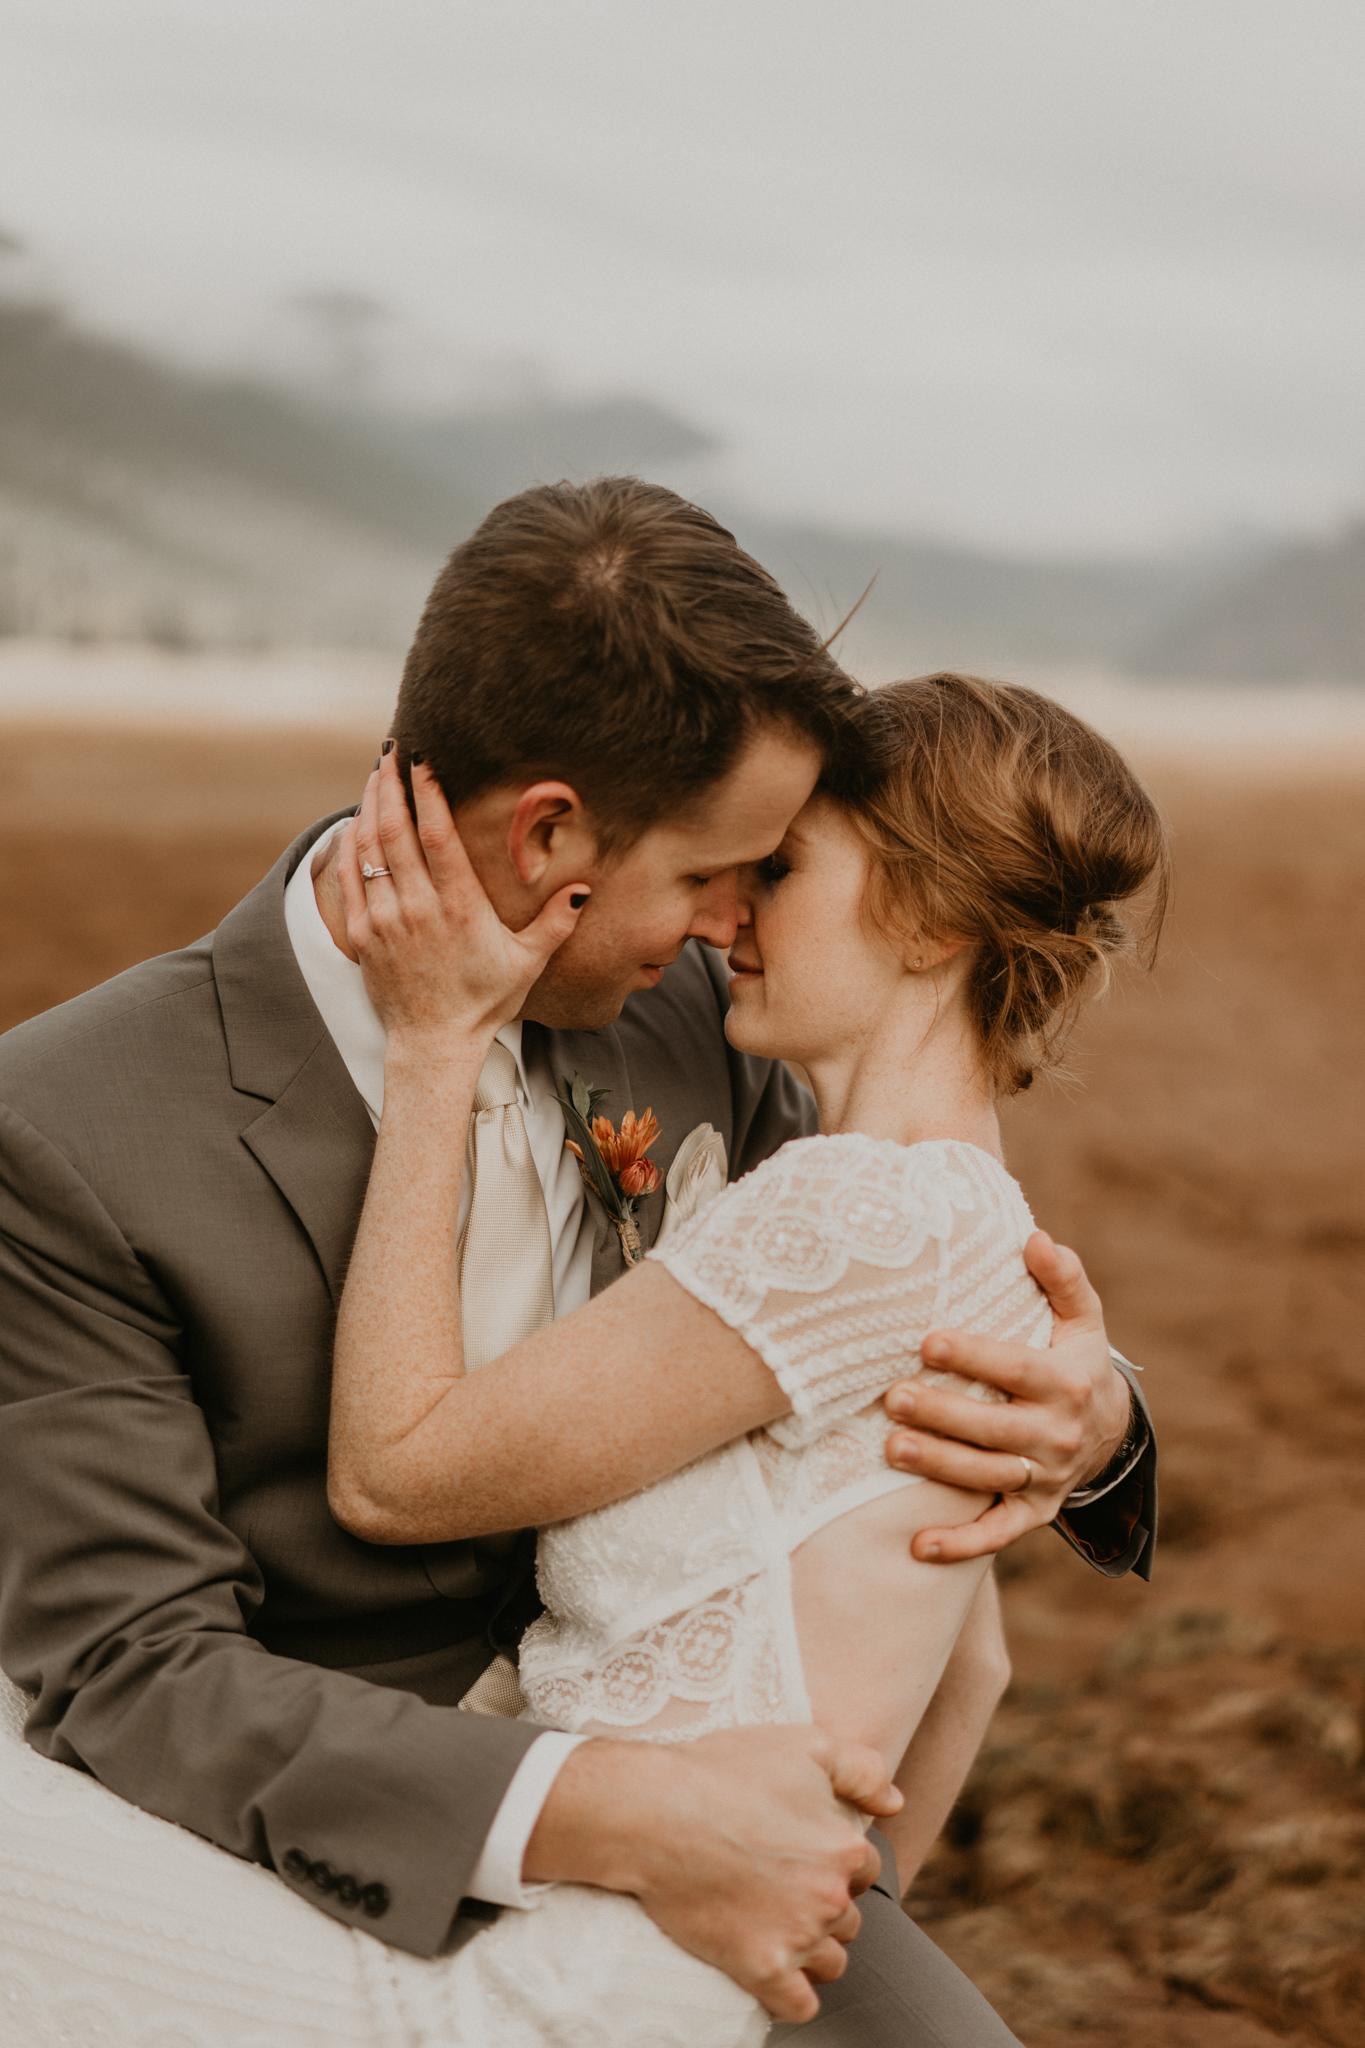 Lake-Cushman-Wedding-Elopement-Engagement-Seattle-Washington-PNW-Adventure-Nature-Photographer-23.jpg